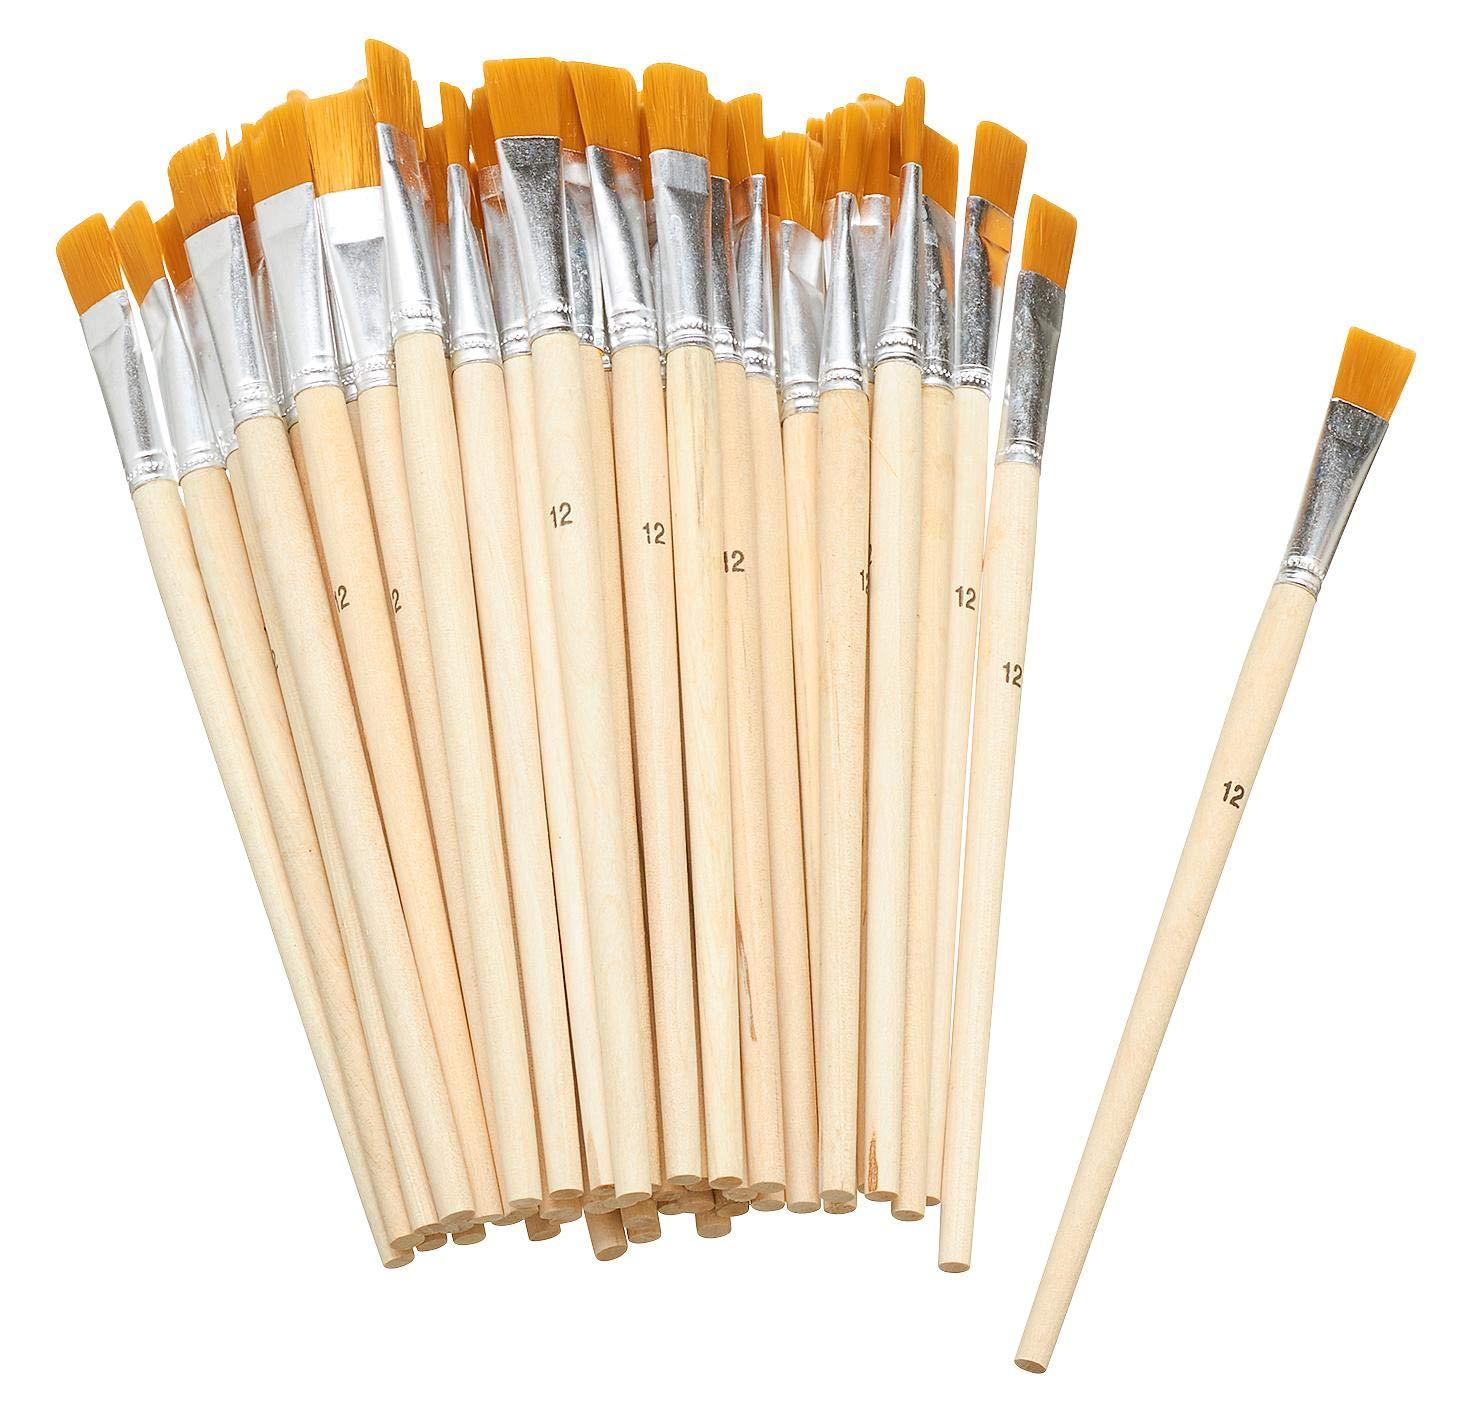 VBS Gro/ßhandelspackung 50 Flachpinsel Acrylpinsel malen Synthetikhaar Gr/ö/ße 10